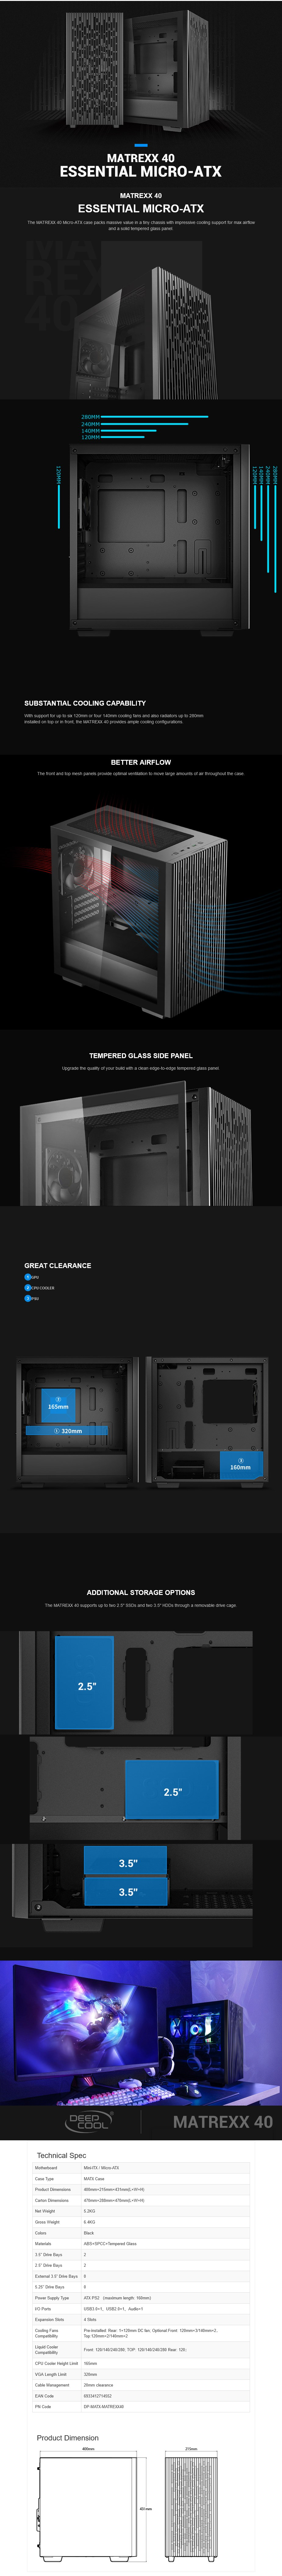 Deepcool MATREXX 40 Tempered Glass Micro-ATX Case - Black - Desktop Overview 1